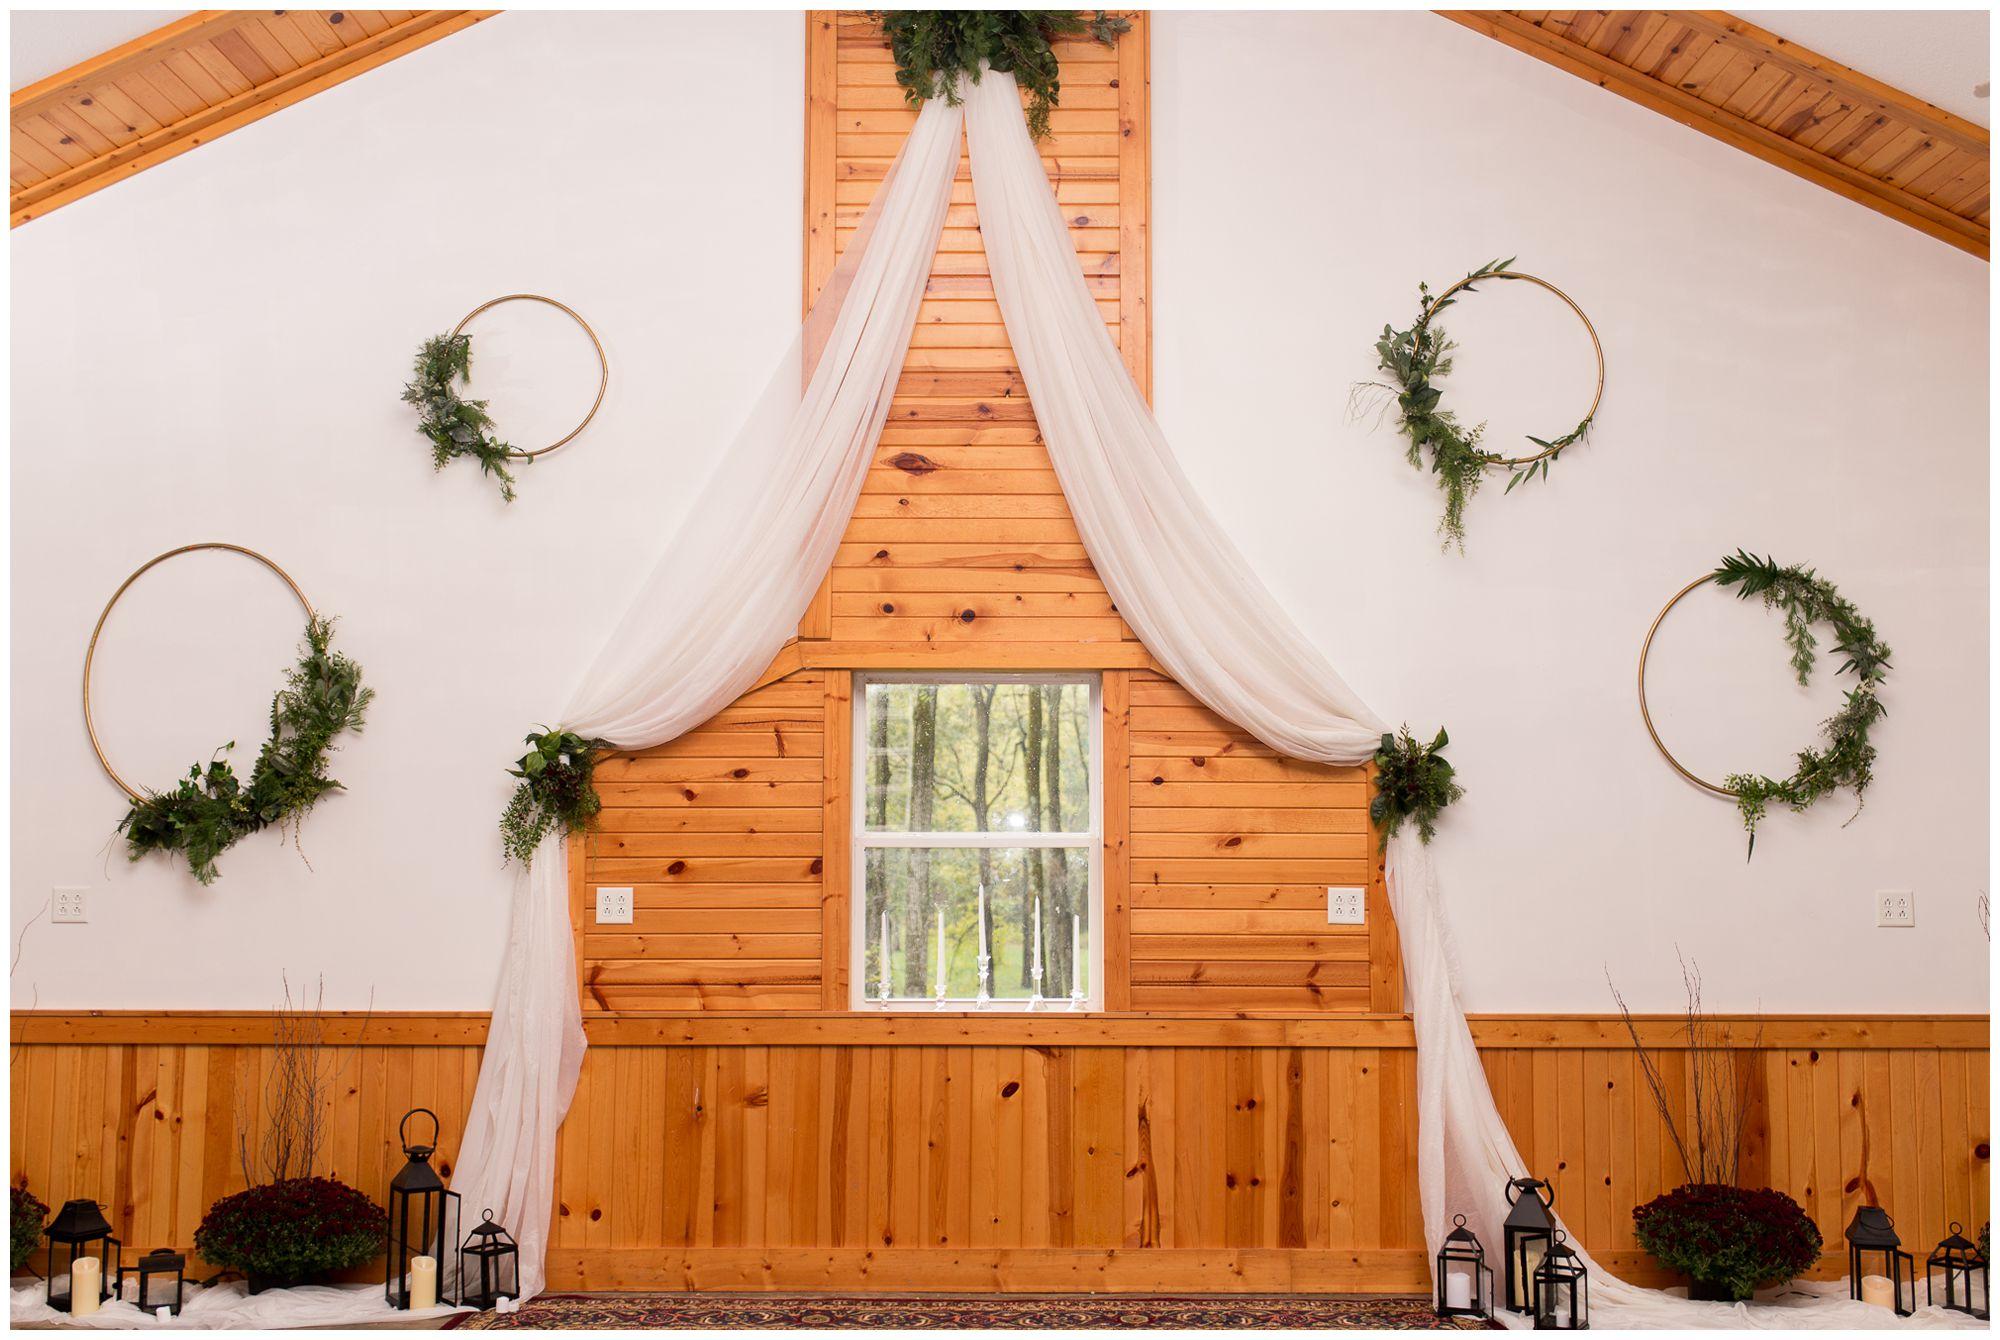 Western Howard Conservation Club wedding venue in Peru Indiana